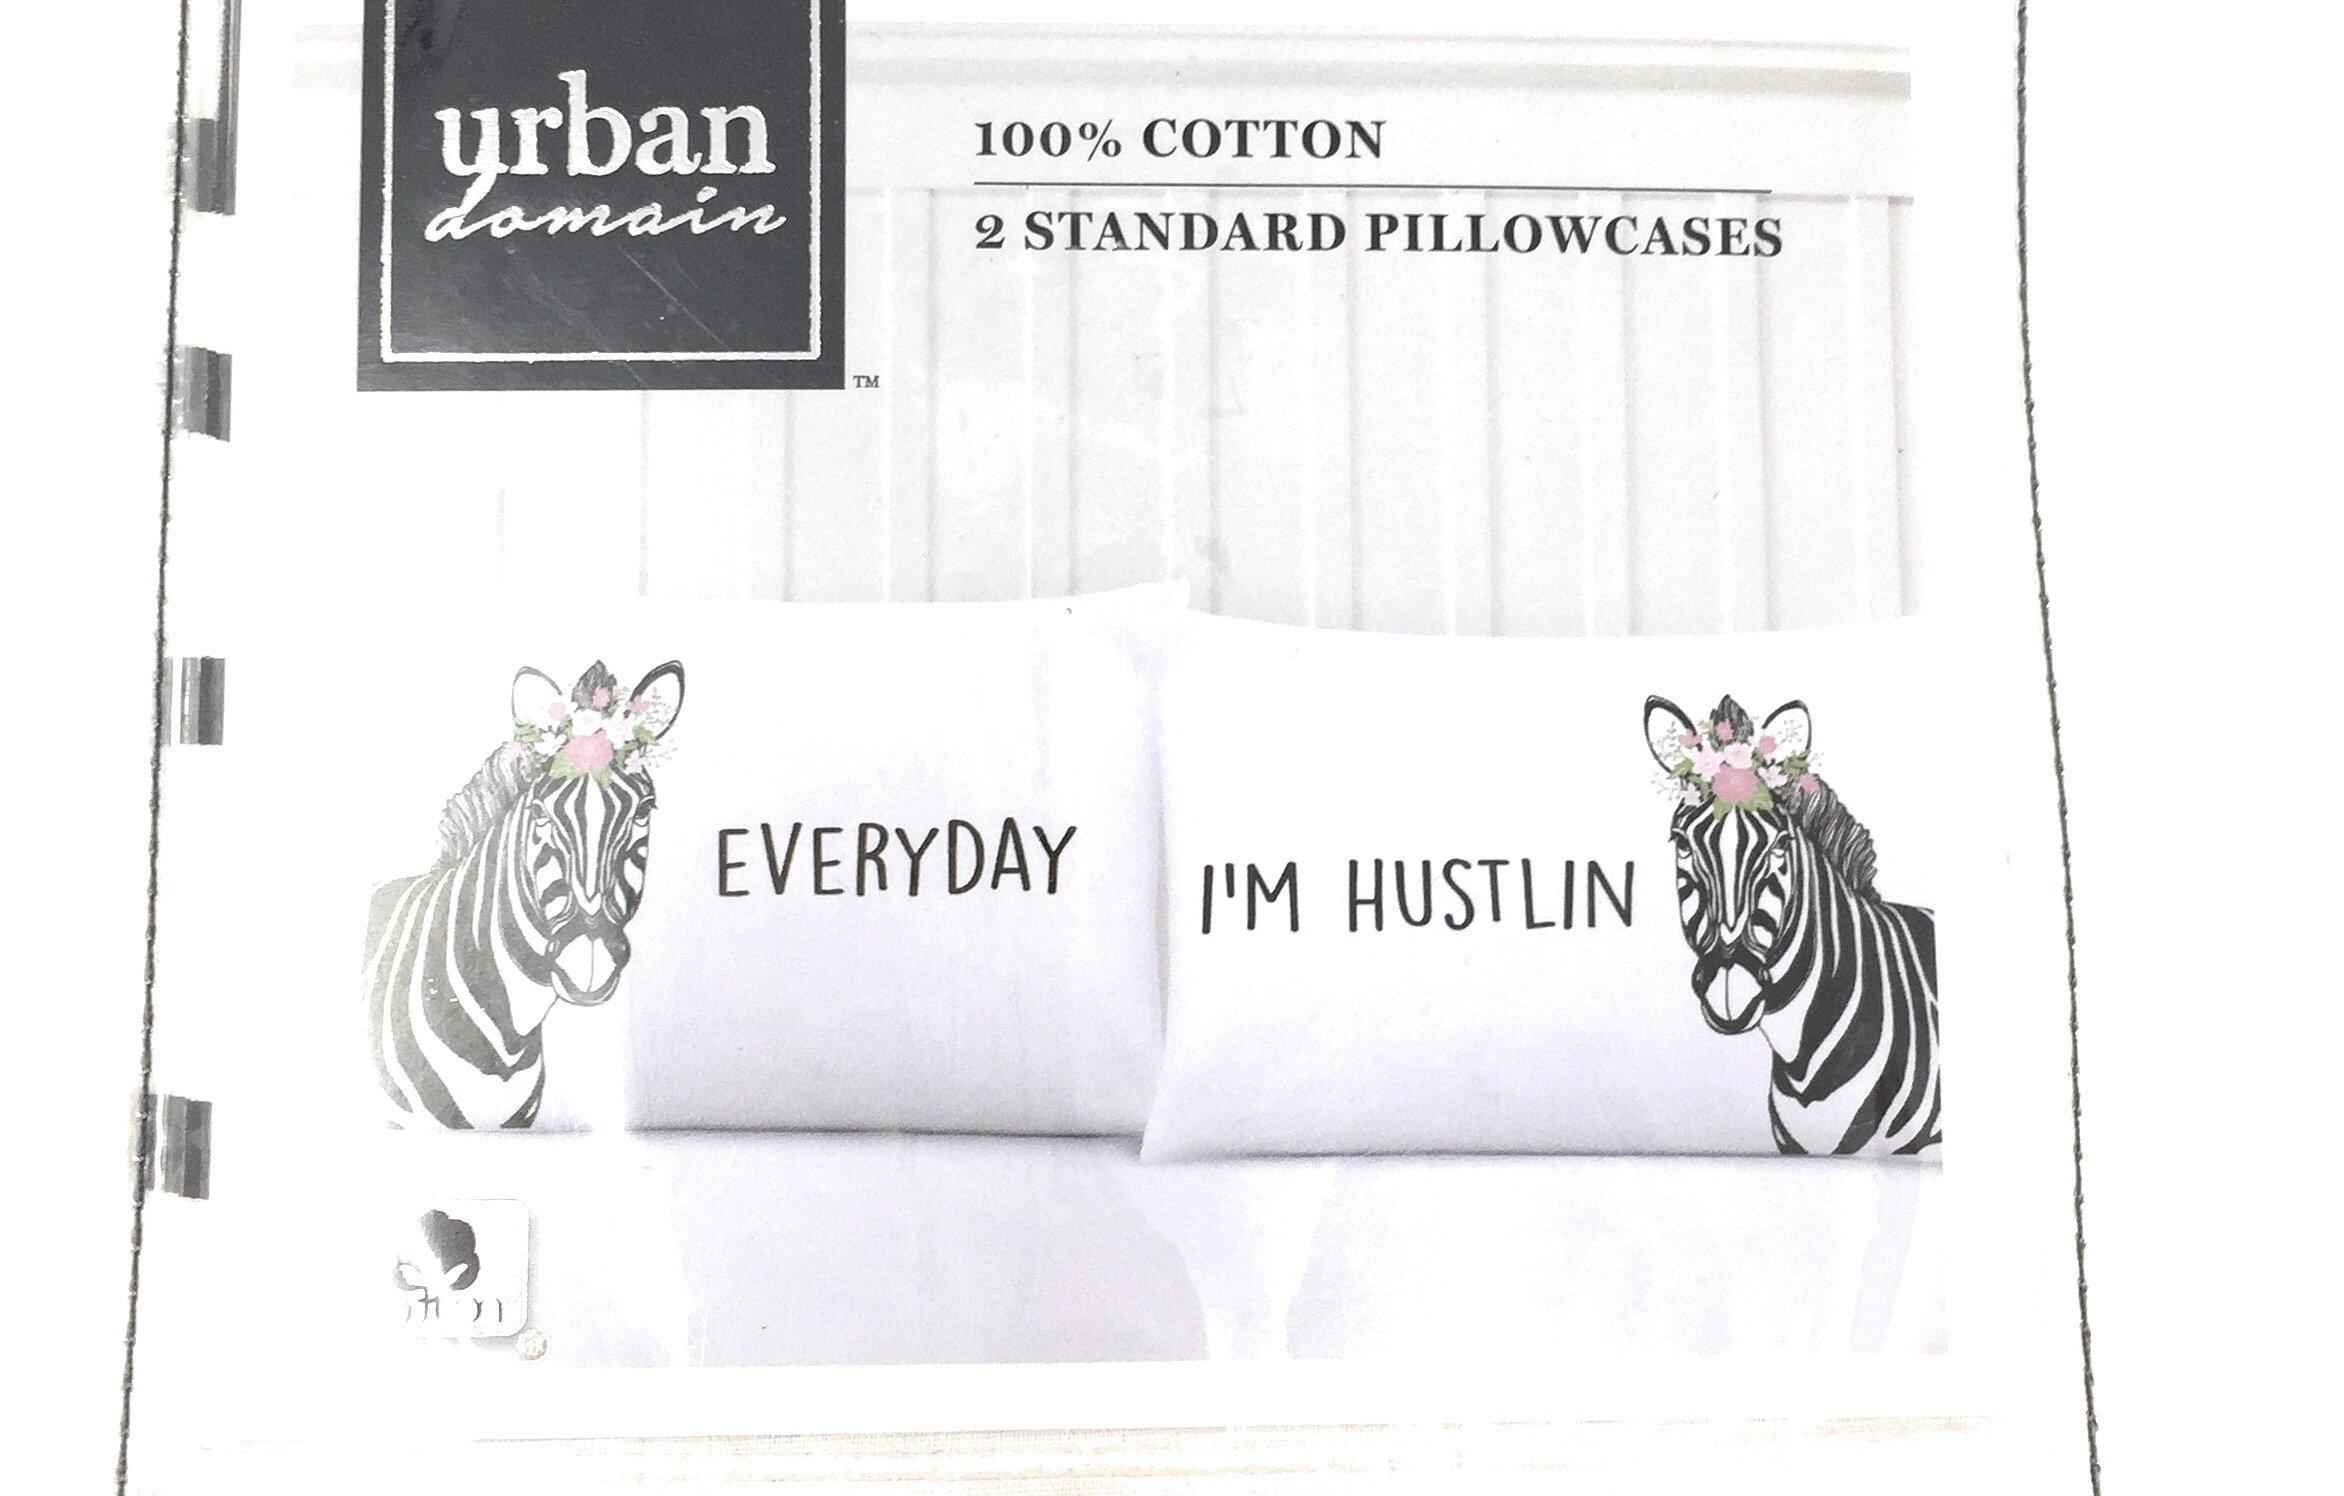 Urban Domain|100% Cotton|2-Standard Pillowcases|EVERYDAY I'M HUSTLIN